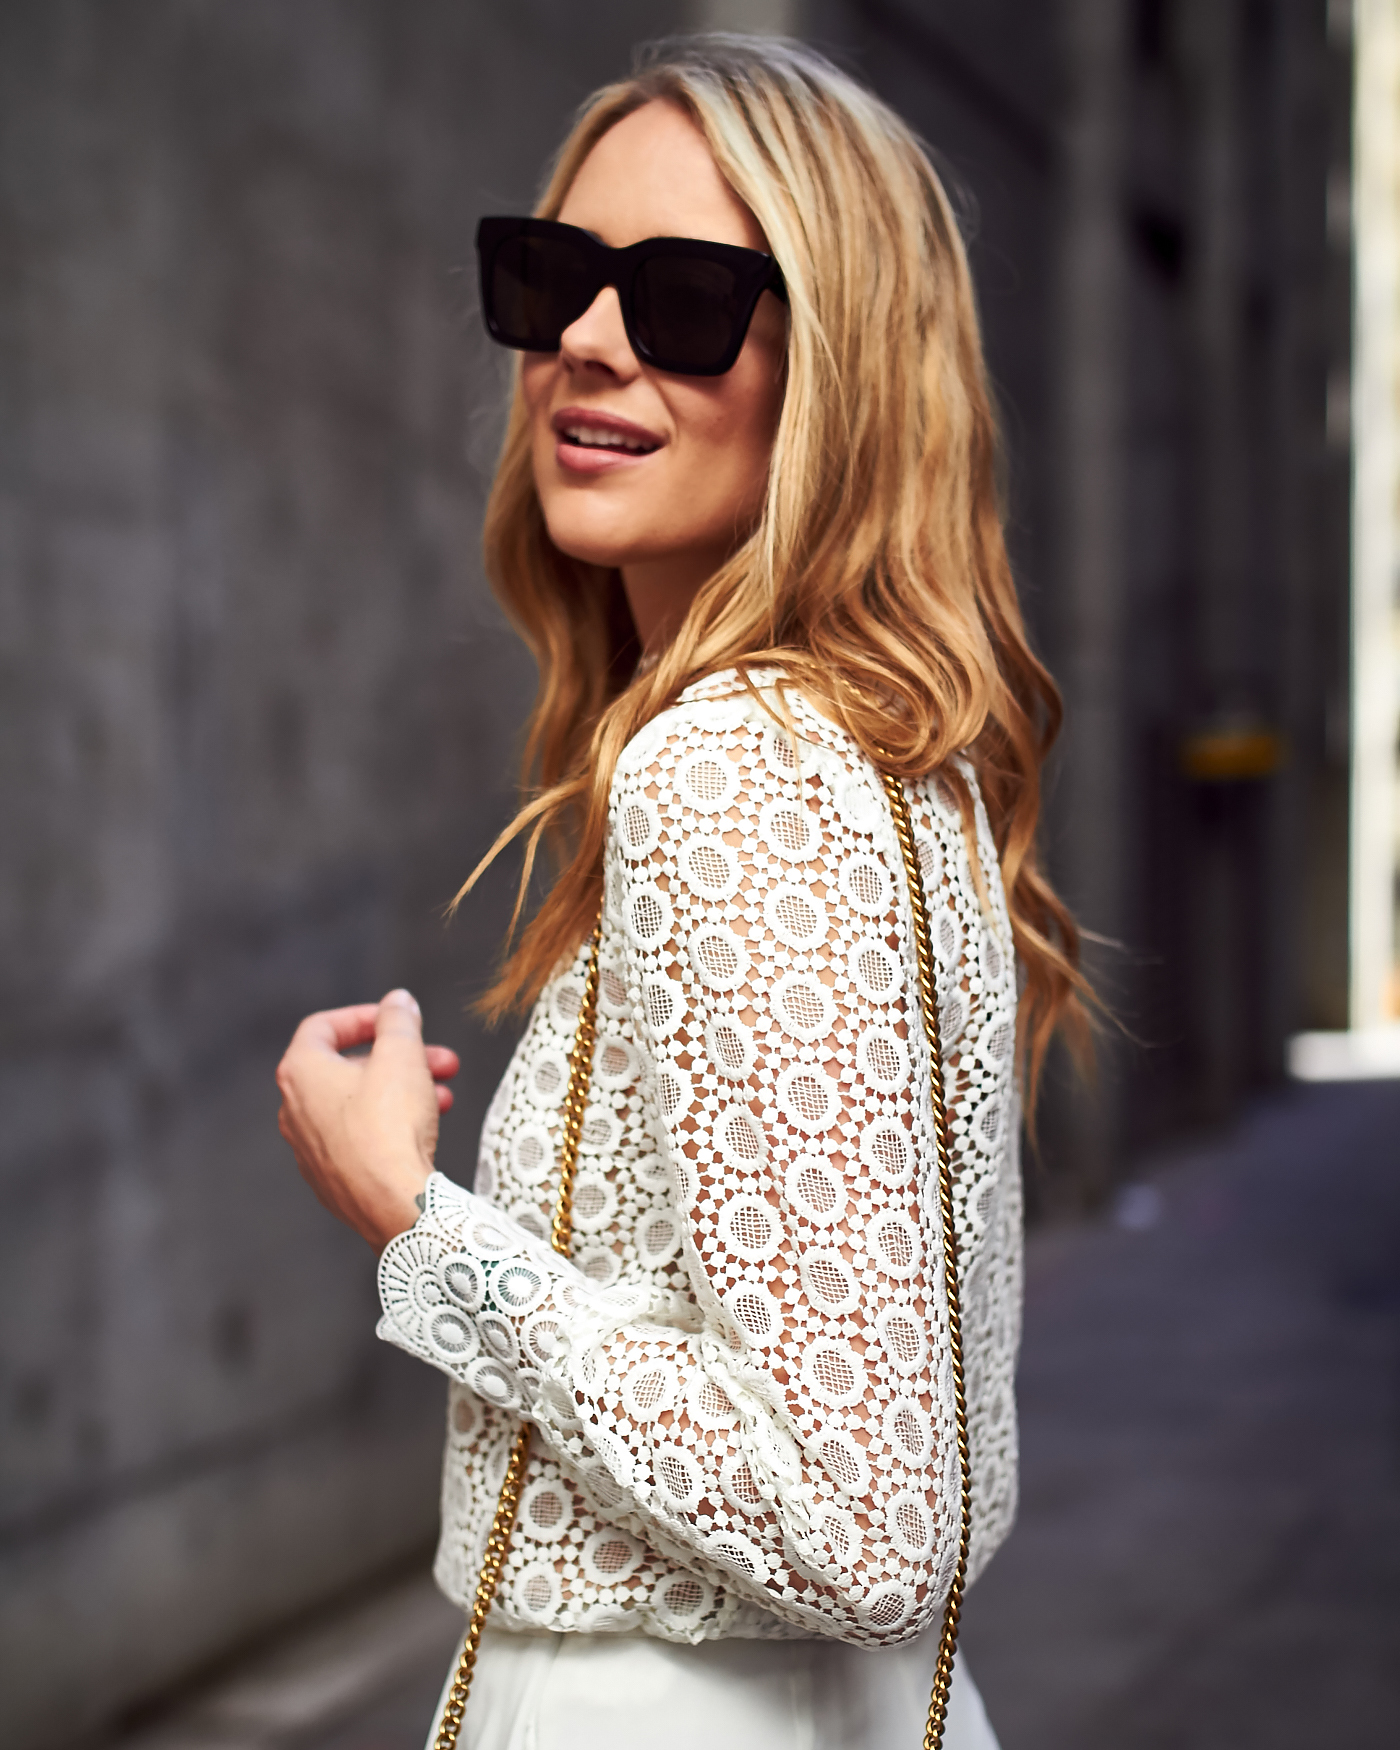 Fall/Winter Outfit, Head-to-toe-white, H&M Long Sleeve White Lace Blouse, White Wide Leg Pants, Gucci Marmont Handbag, Black Celine Sunglasses